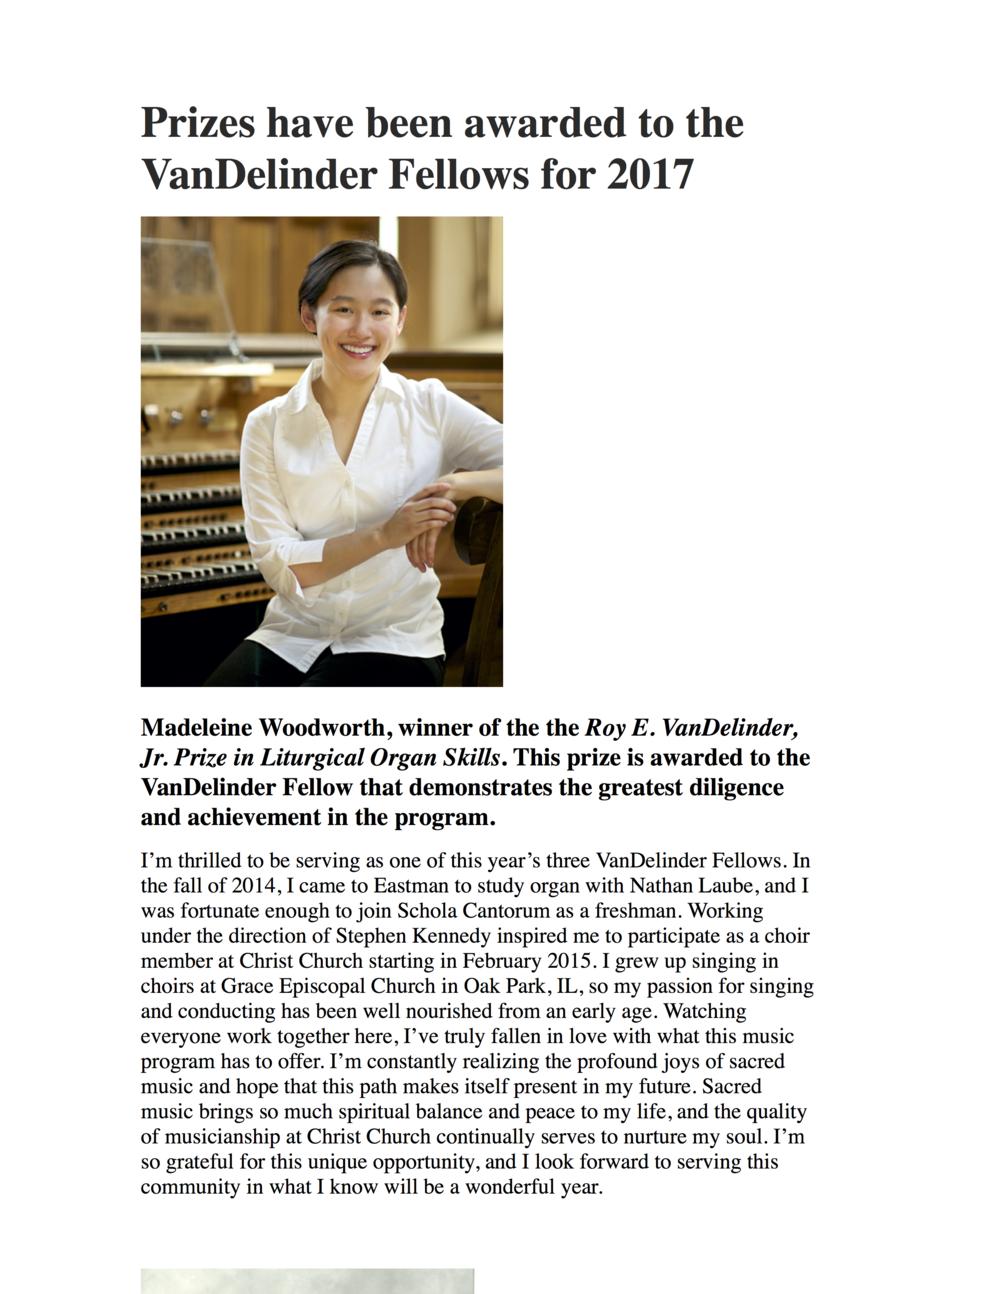 VanDelinder Fellows Prize and Awards for 2017.png